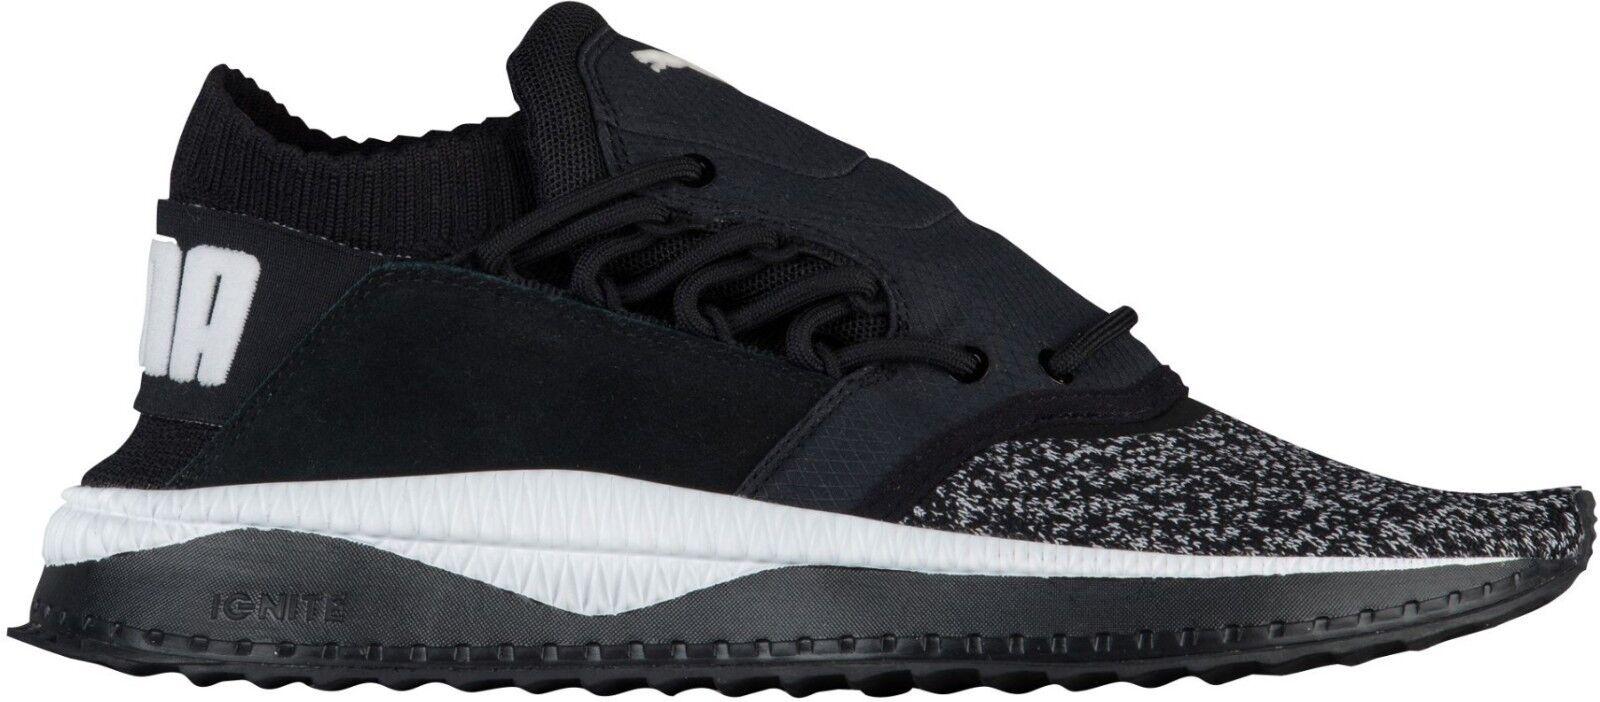 Puma Men's TSUGI SHINSEI NOCTURNAL Running shoes Puma Black 363760-01 b